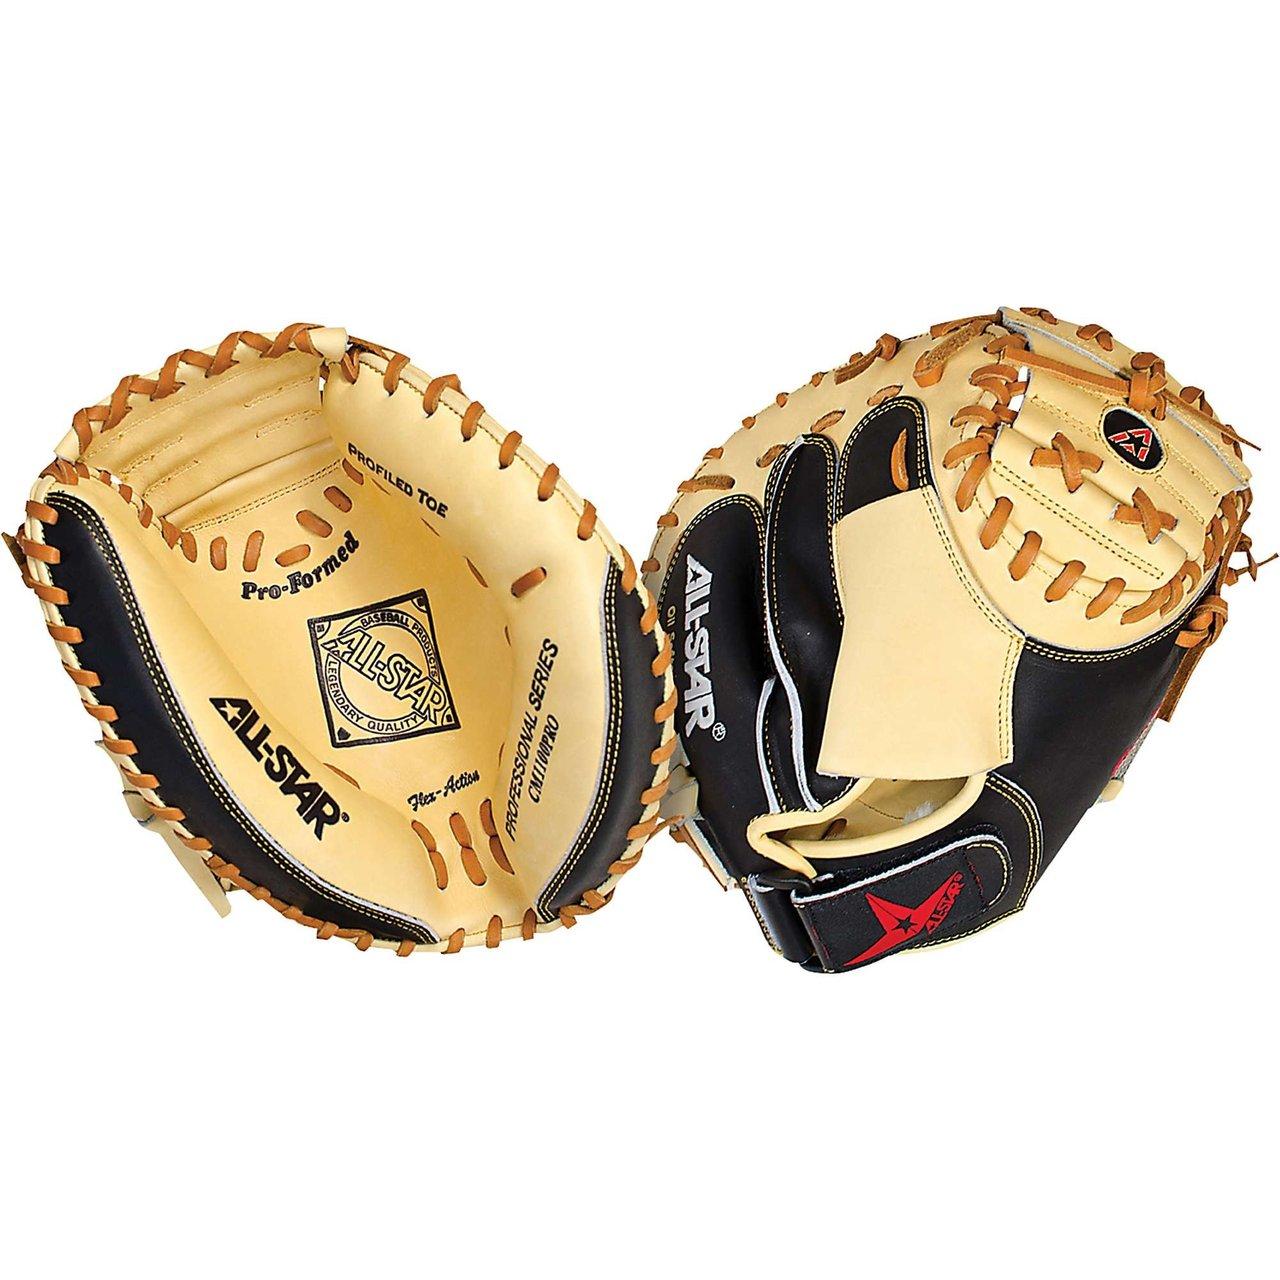 all-star-cm3100bt-34-baseball-catchers-mitt CM3100BT All-Star 029343300929 AllStar Pro Catchers Mitt Cataloged at 35 looks like 34. This